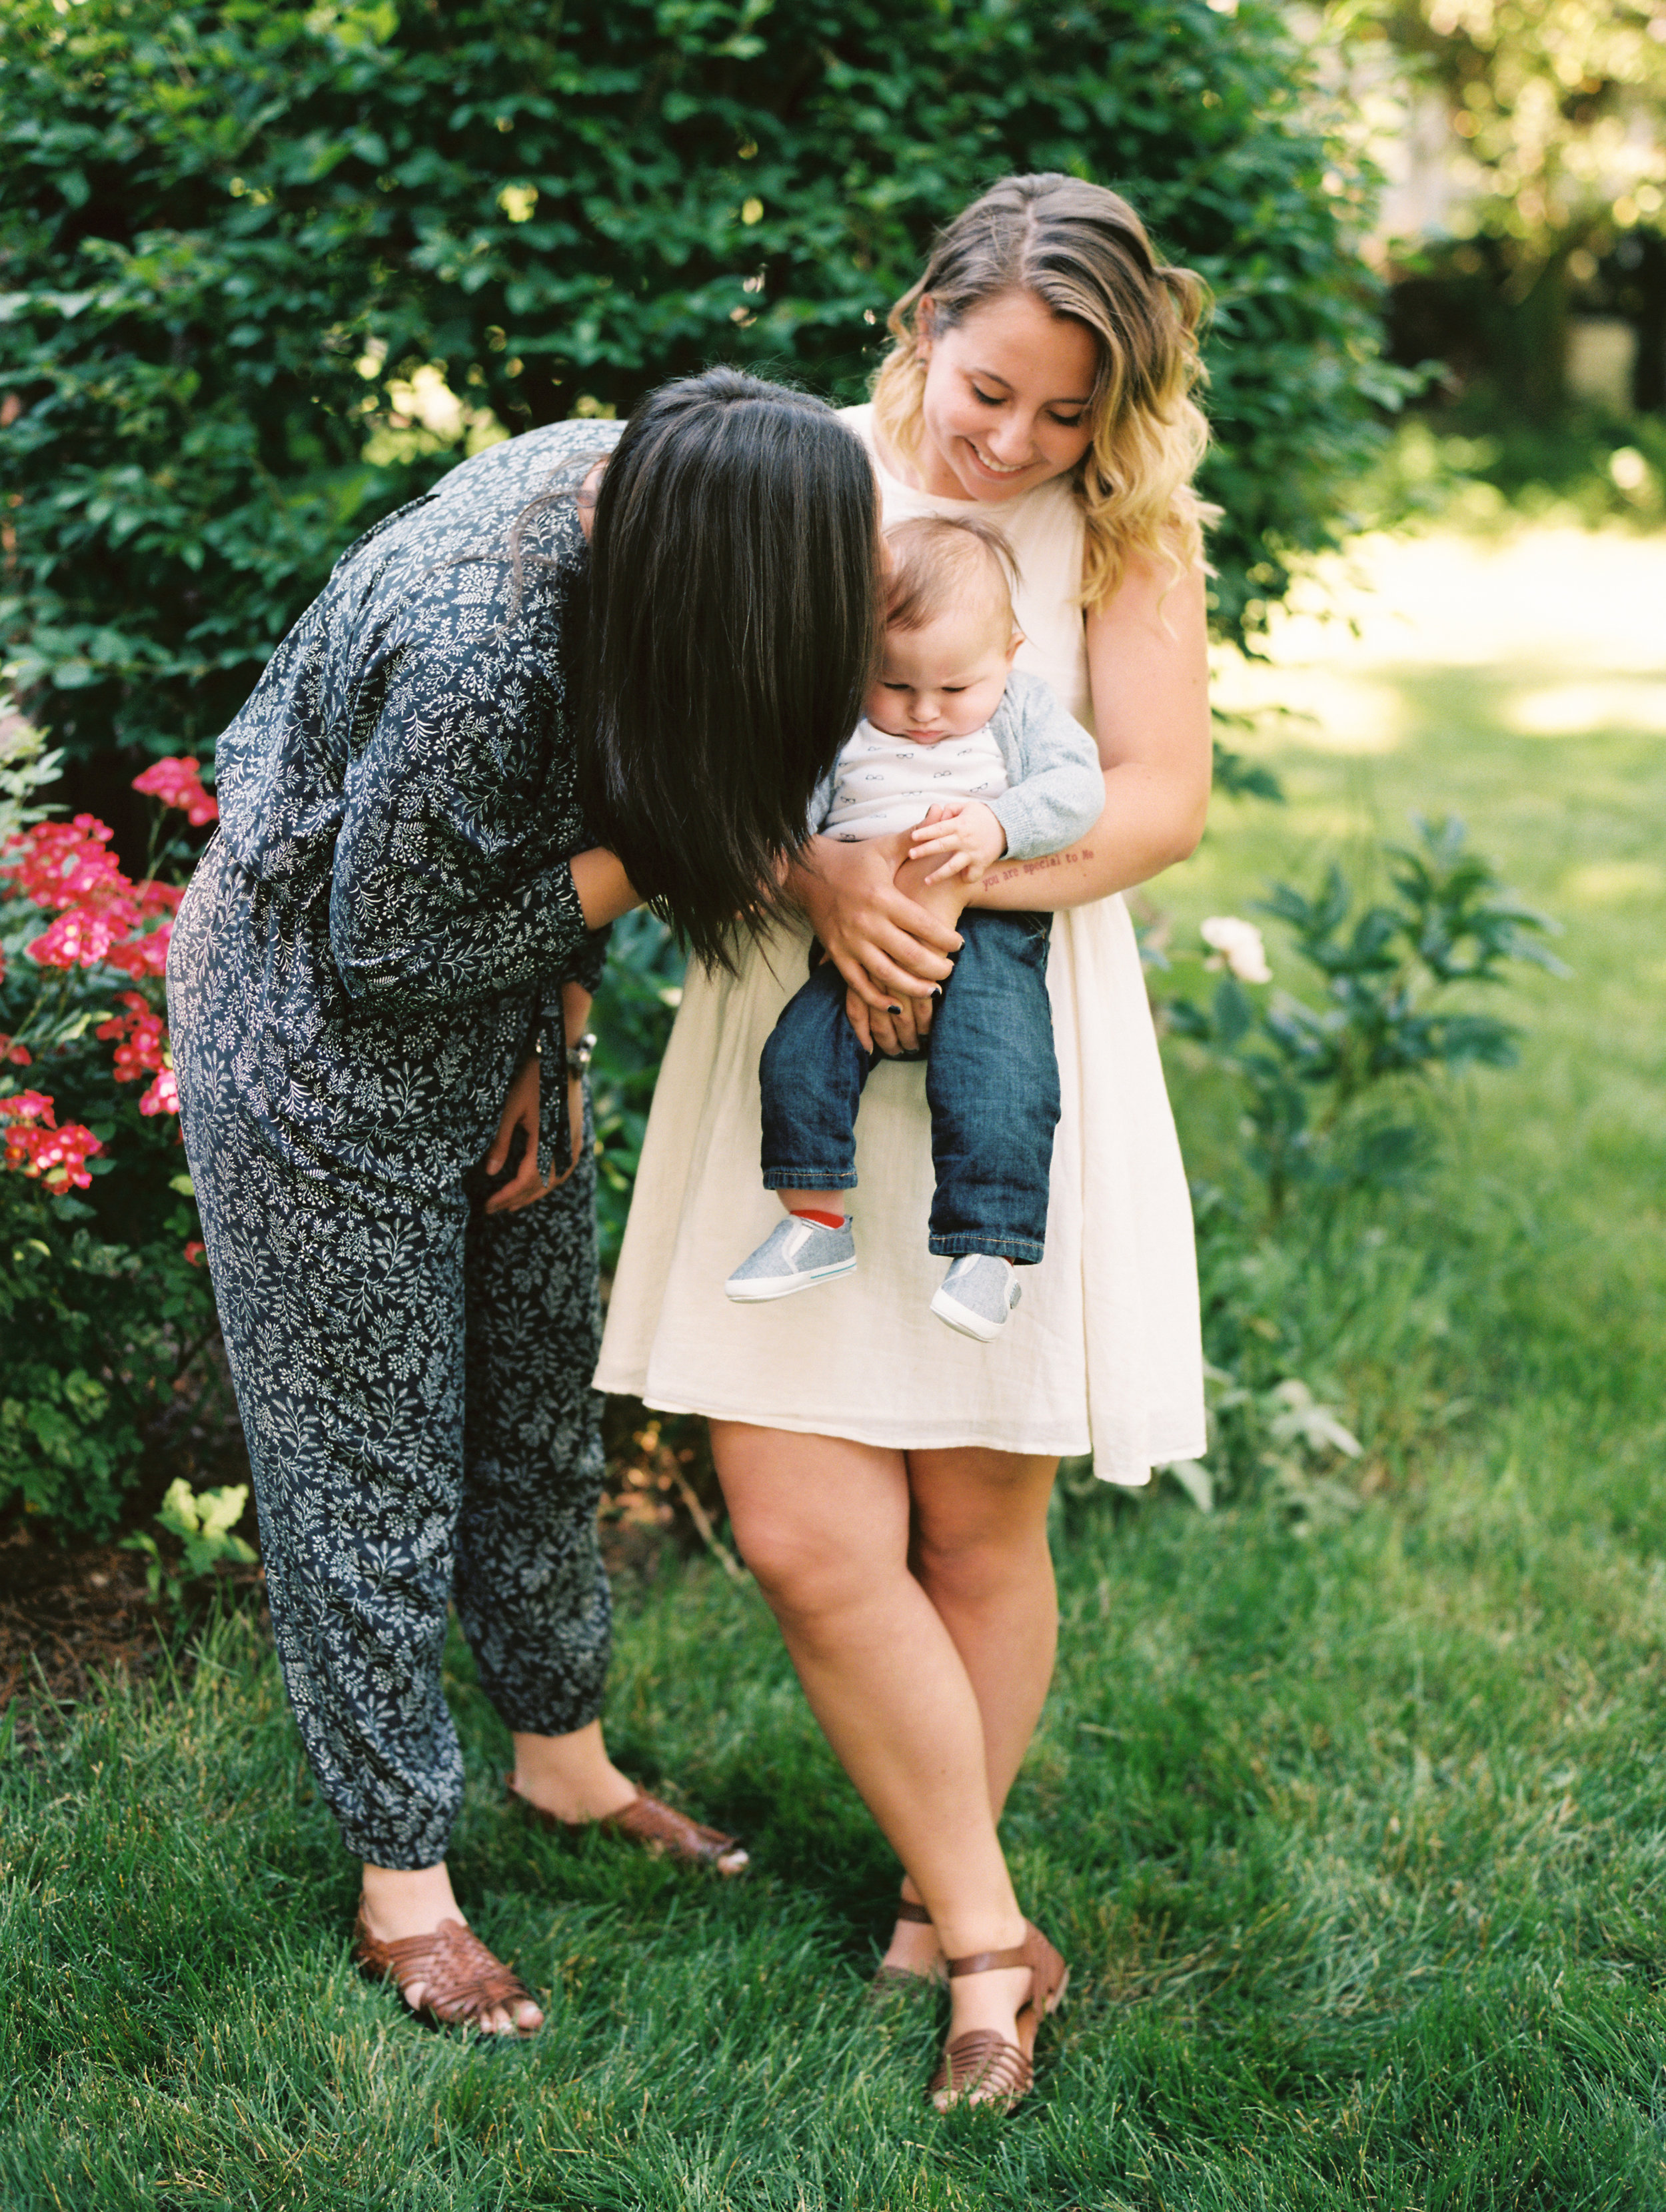 illinois family photographer Catie Scott Studio Film contax 645_14.jpg